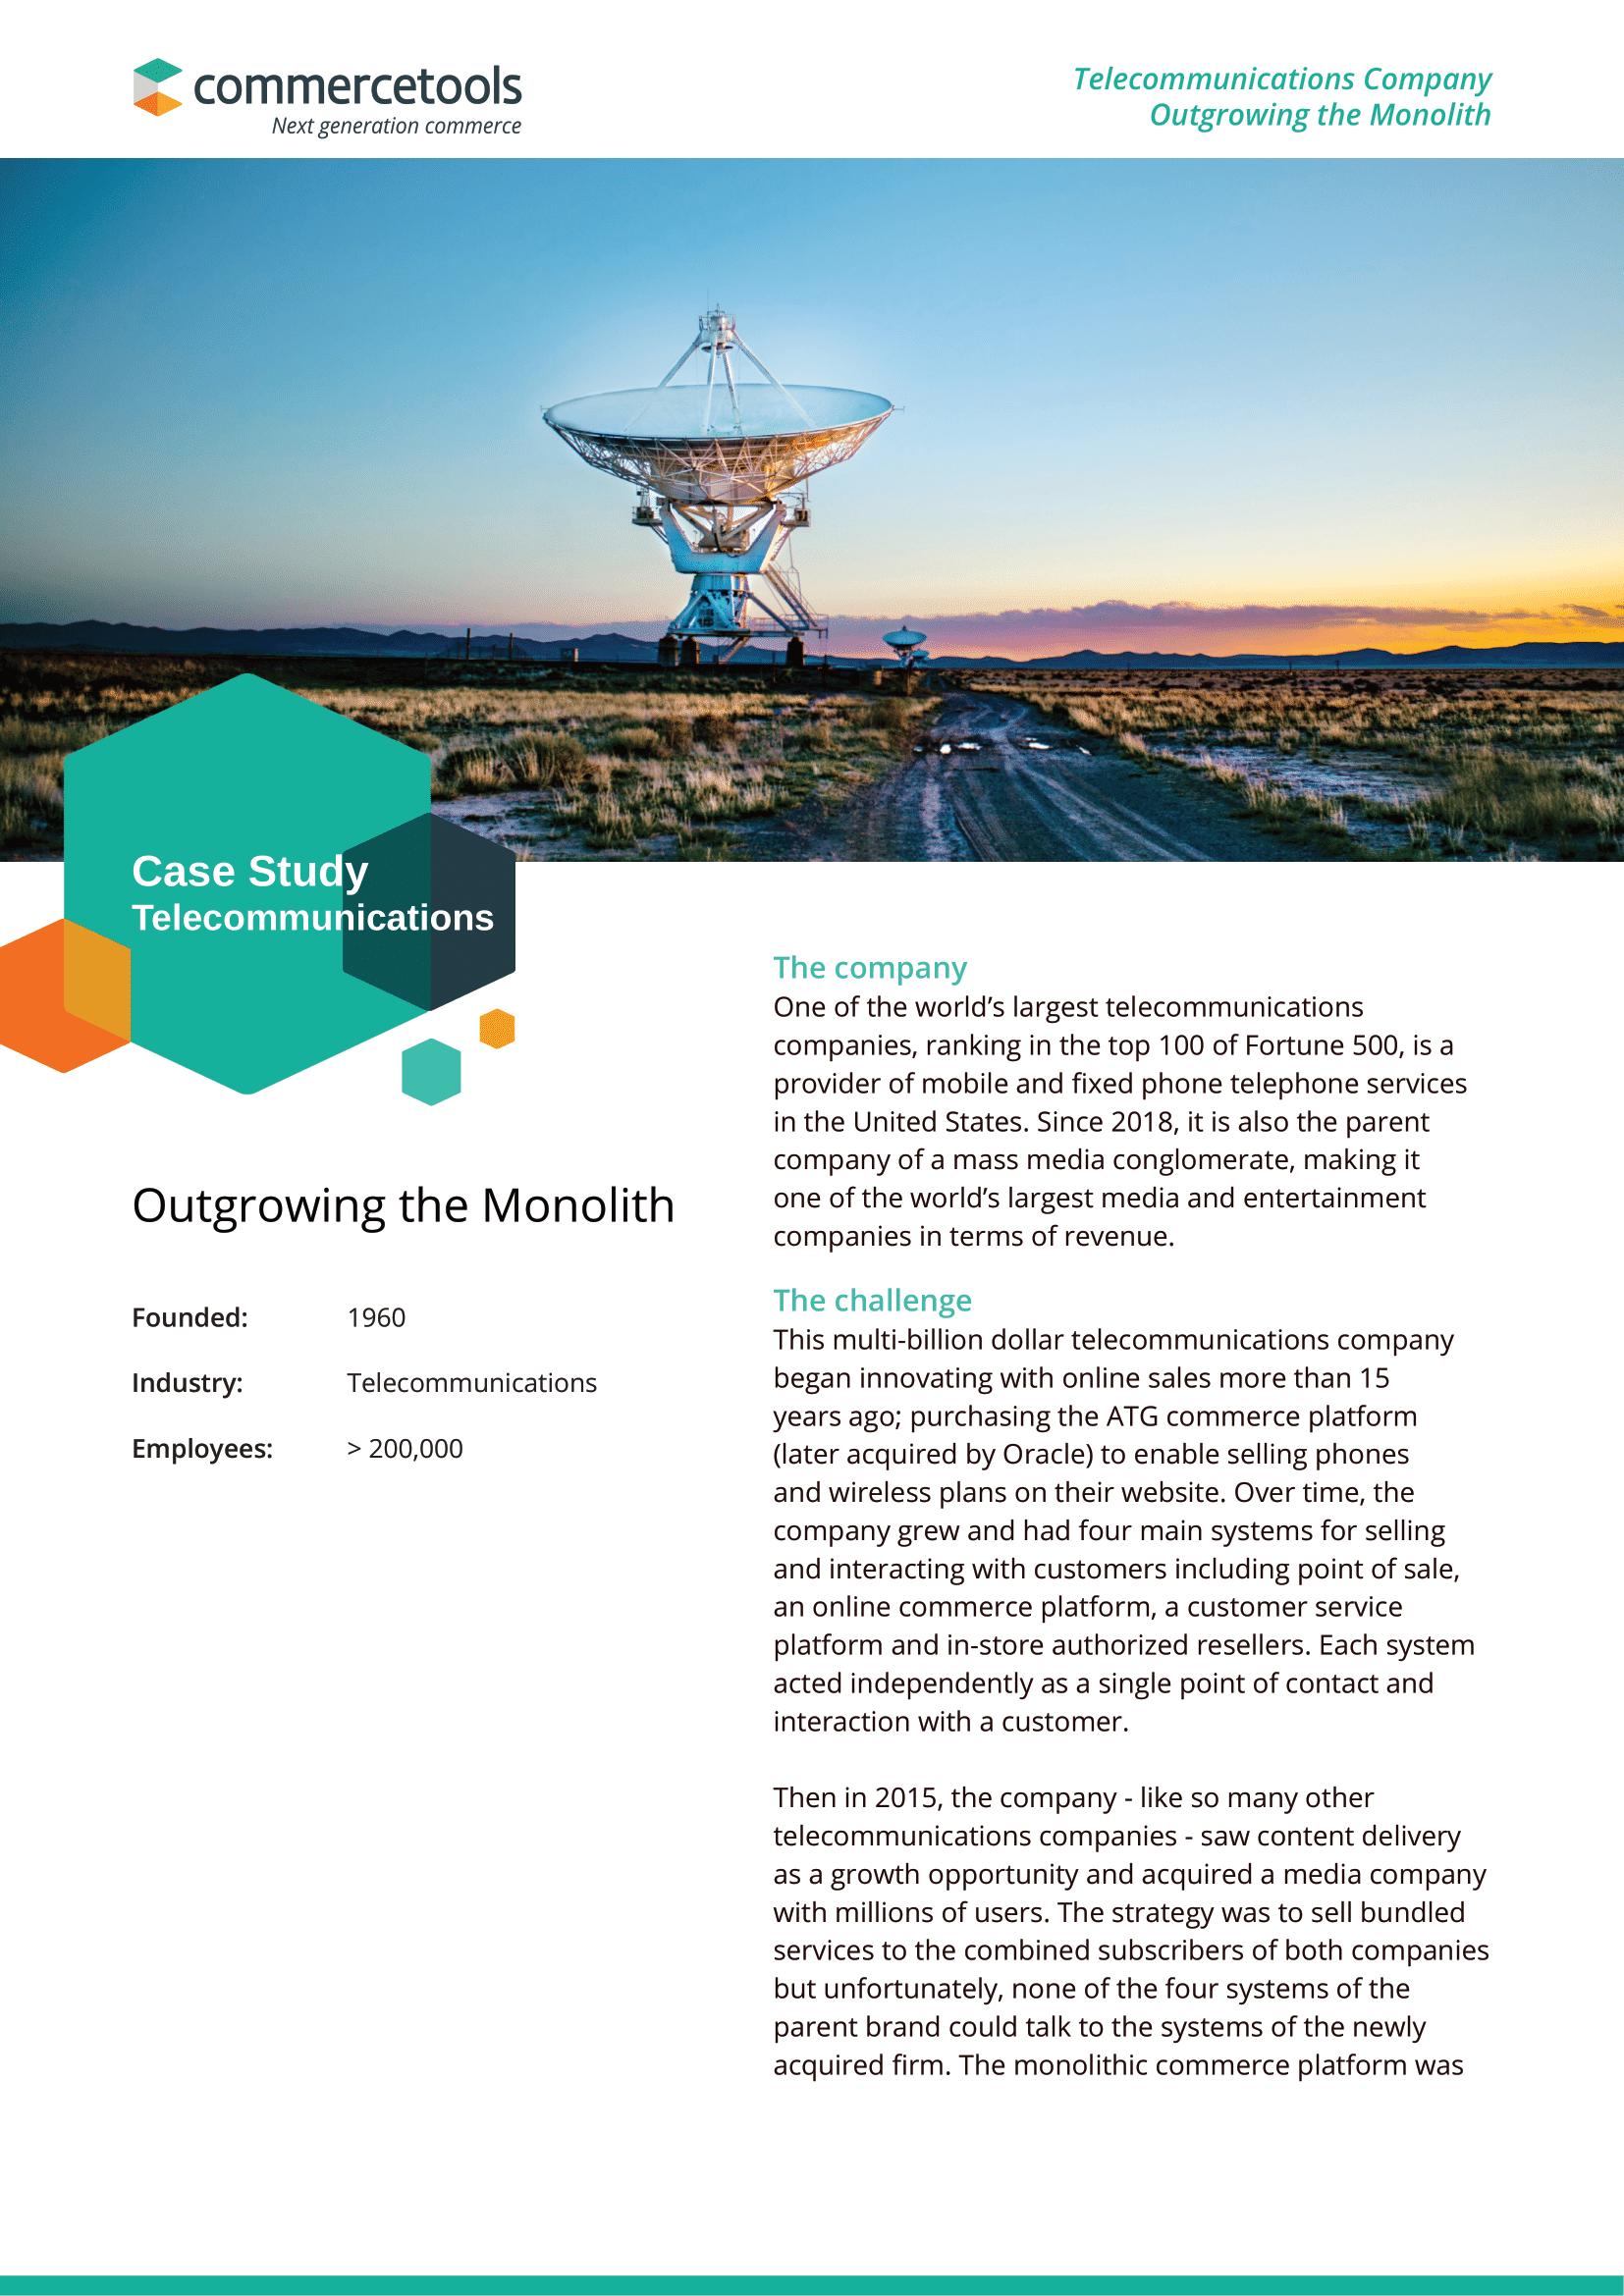 Case Study: Telecommunications Company Outgrowing the Monolith